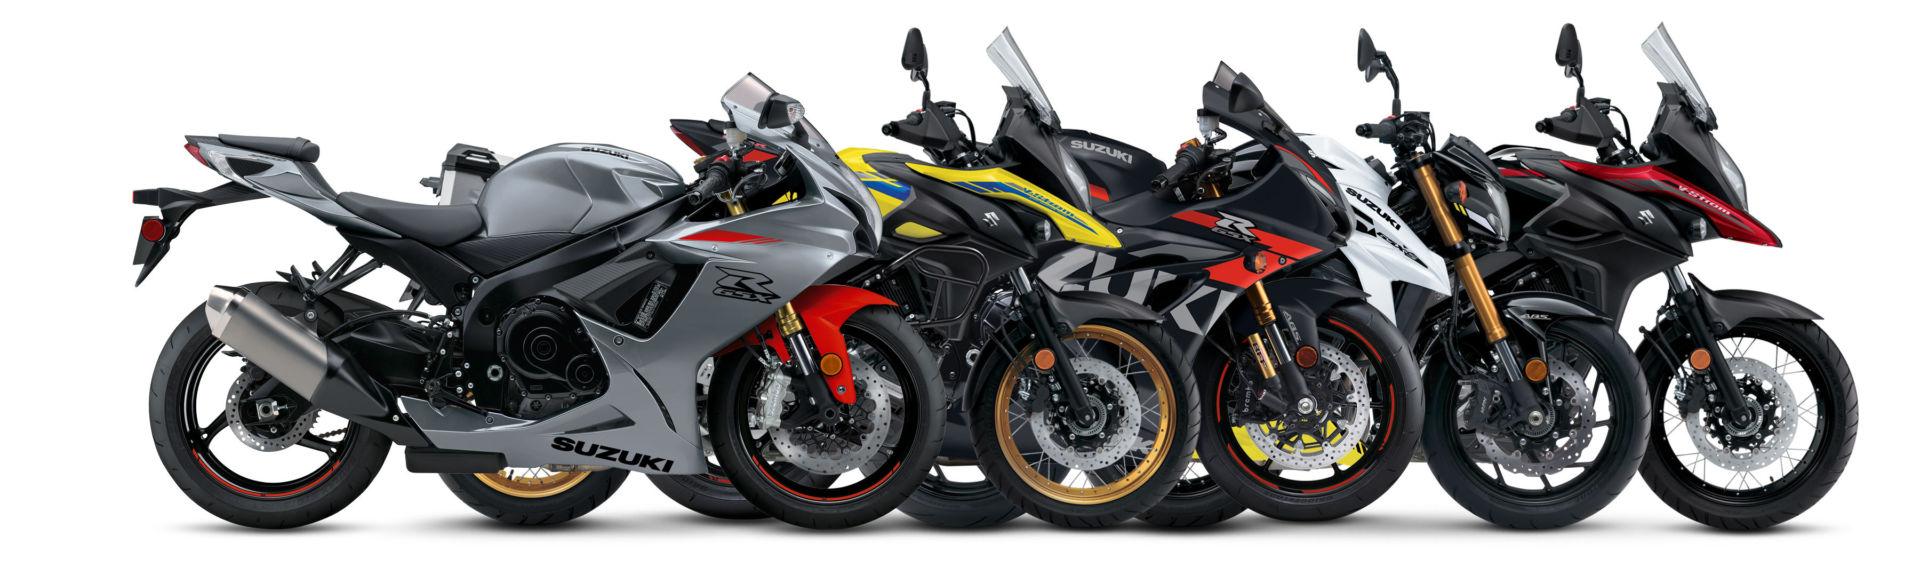 2021 model Suzuki motorcycles (from left): GSX-R750, V-Strom 650XT Adventure, GSX-R1000R, GSX-S750 ABS, and V-Strom 650XT. Photo courtesy Suzuki Motor of America, Inc.